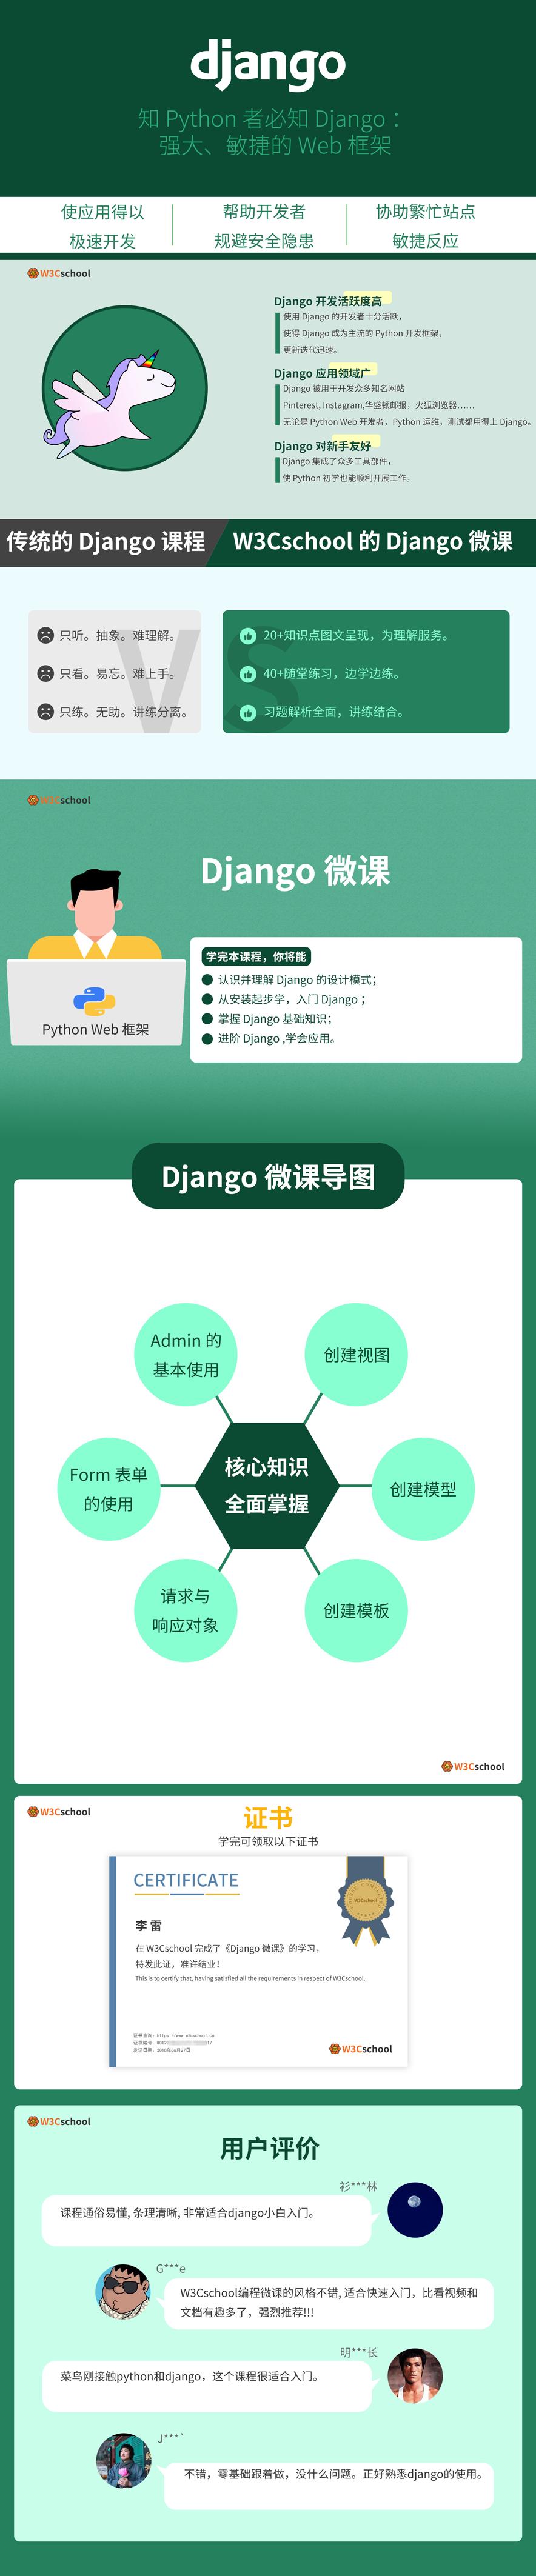 Django微课介绍2